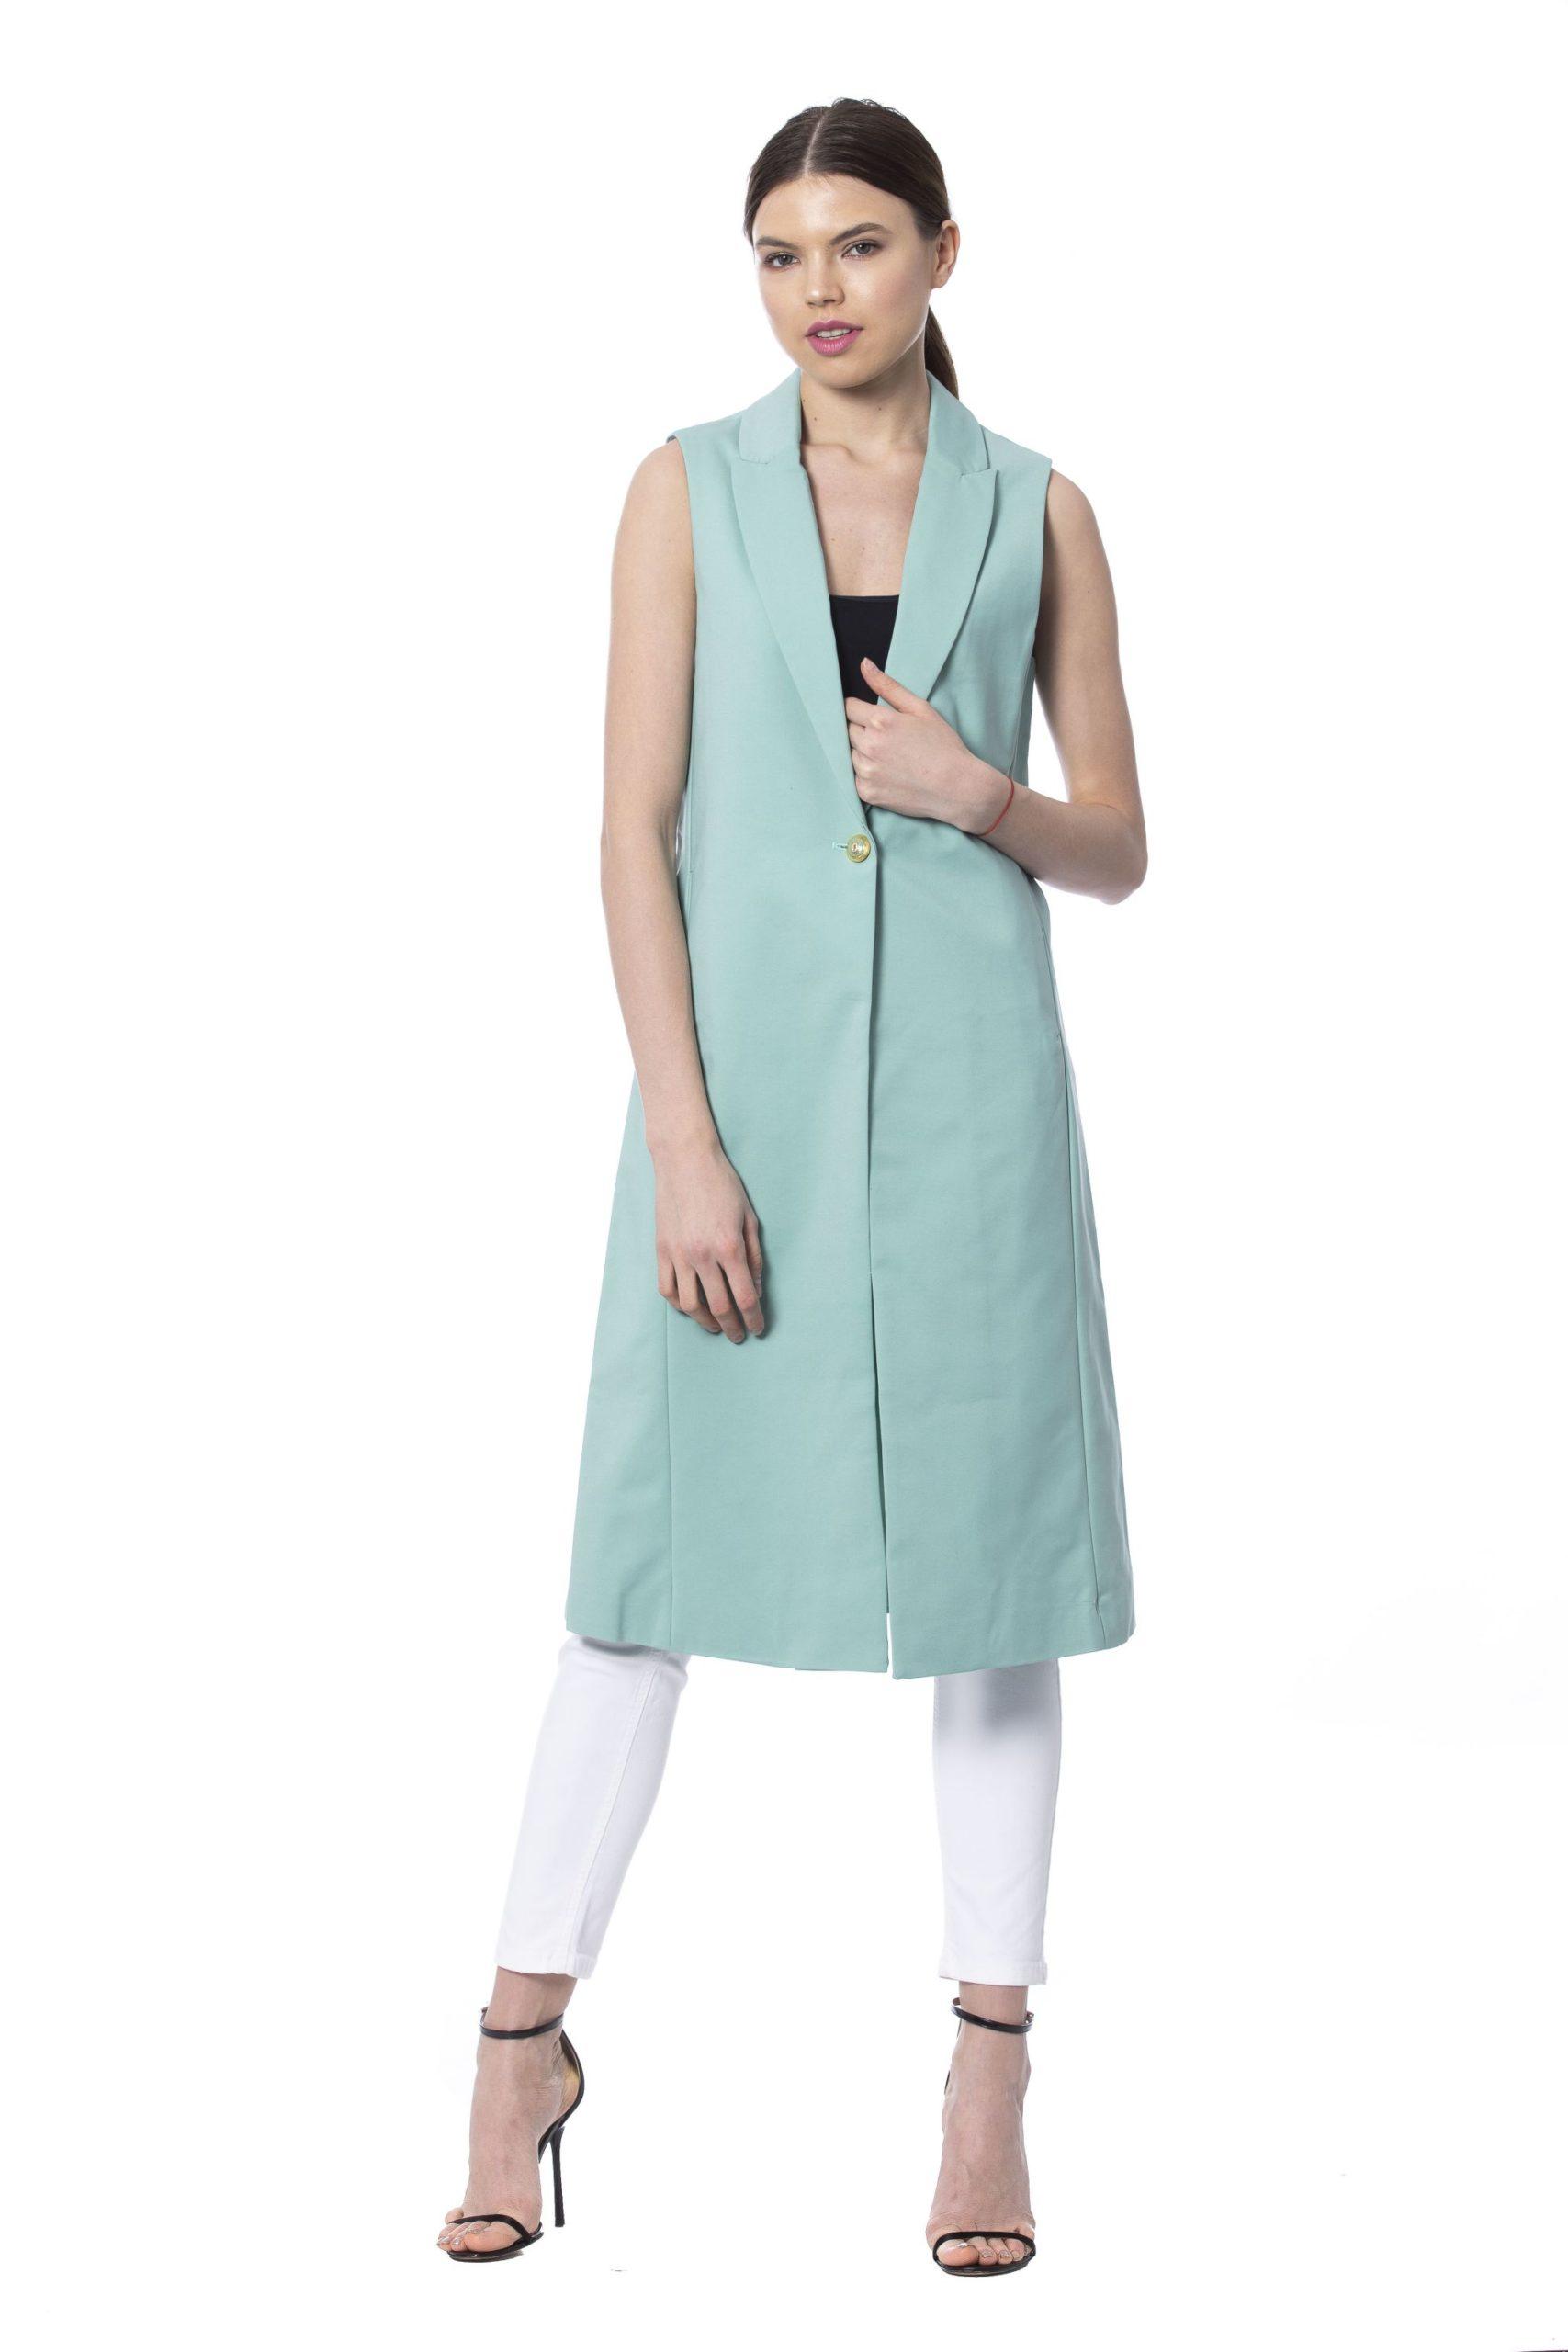 Silvian Heach Women's Jackets Teal SI994780 - XS